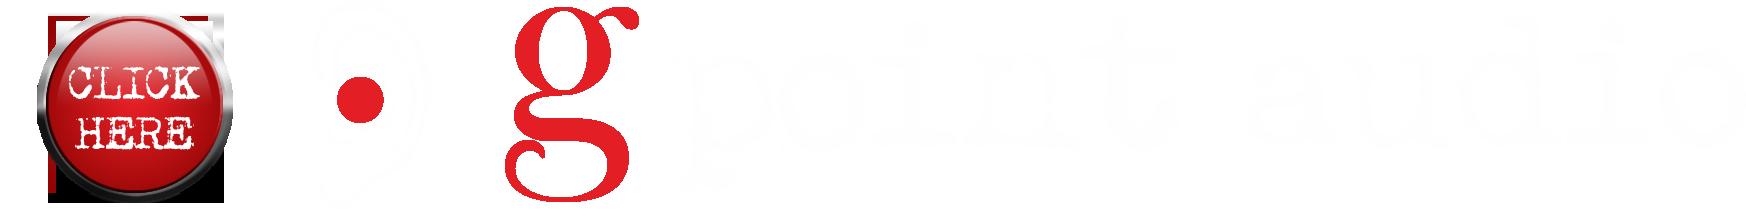 GPoint Audio logo click